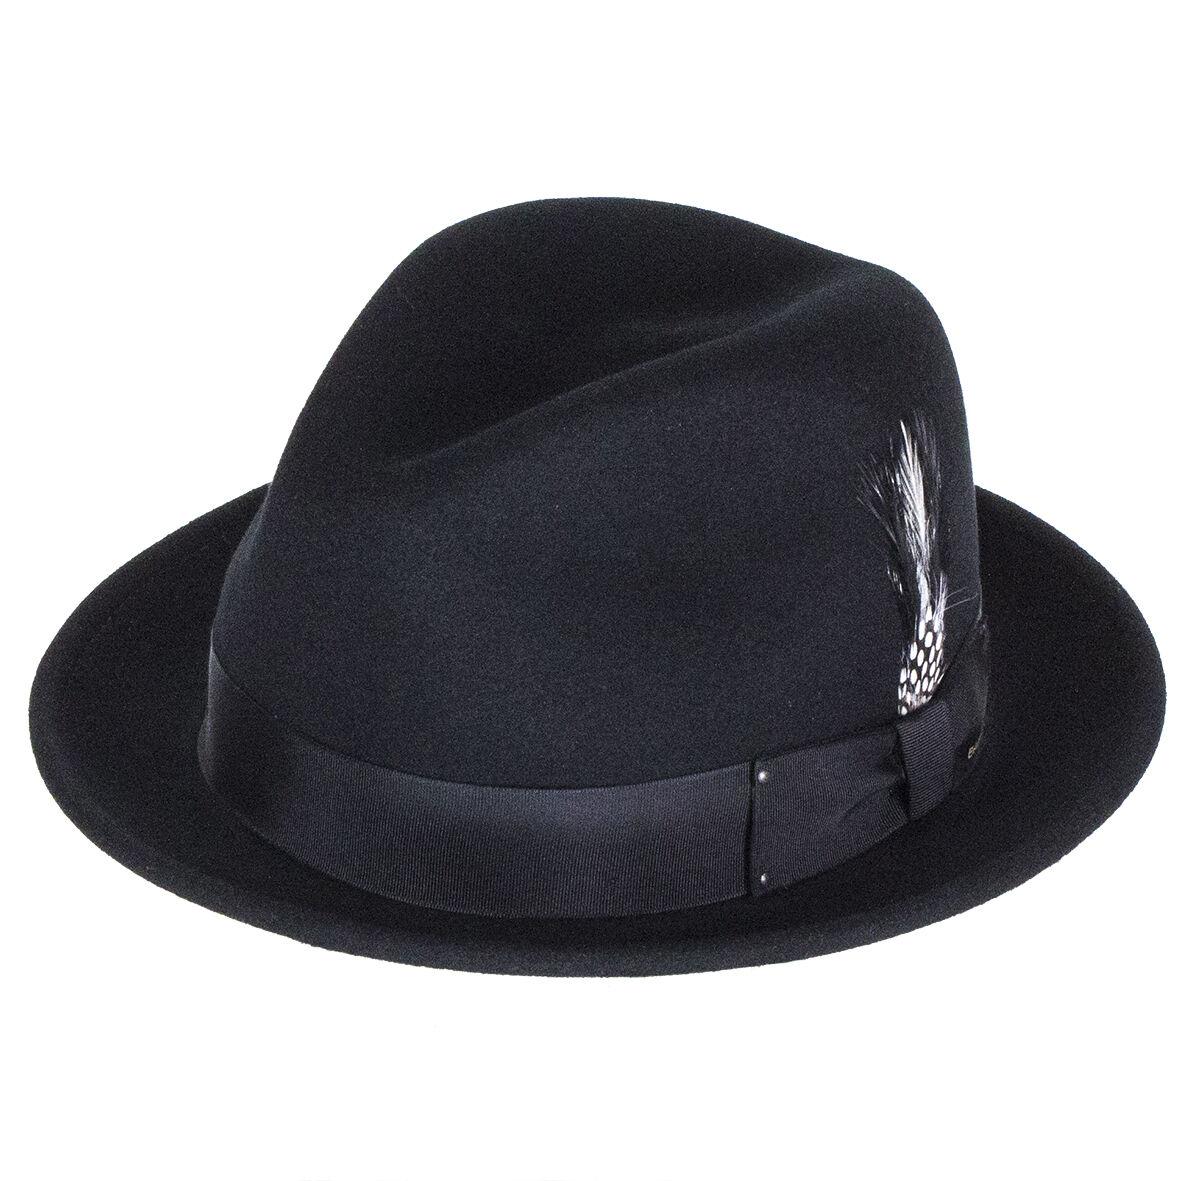 Bailey Hats Tino Crushable - Felt Trilby - Crushable Black 5c3e54